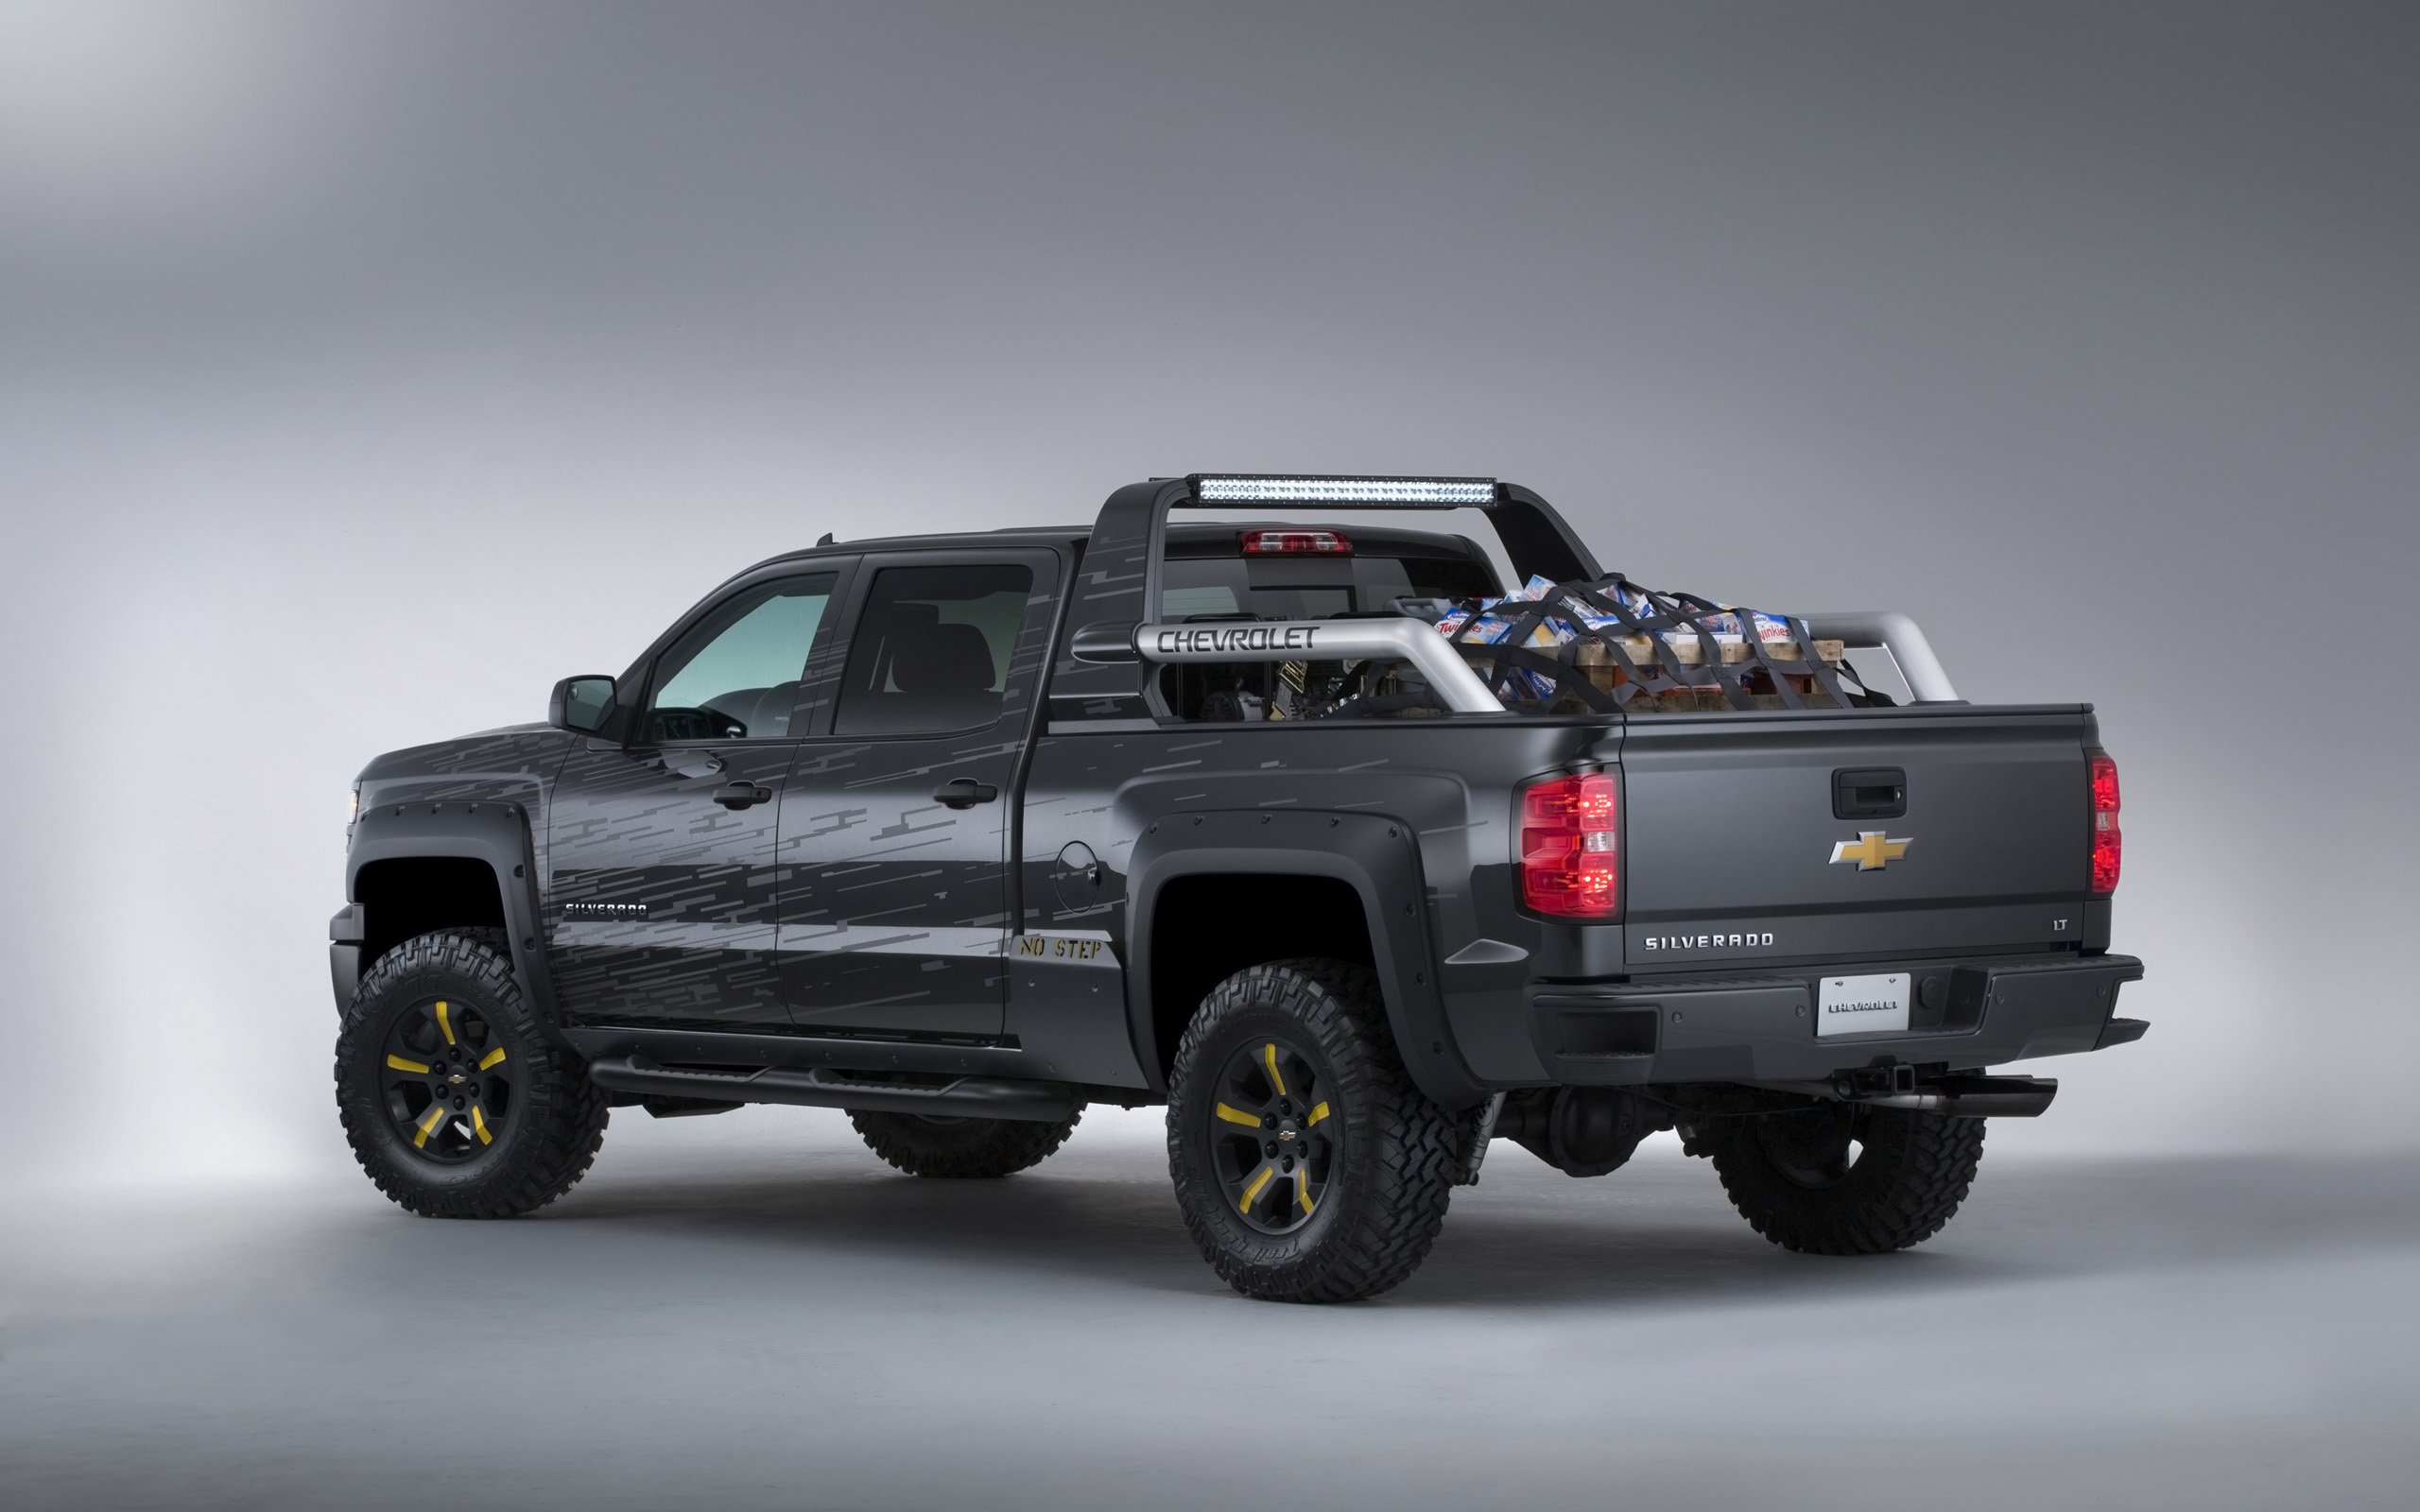 2013 chevrolet silverado black ops concept 4x4 pickup. Black Bedroom Furniture Sets. Home Design Ideas